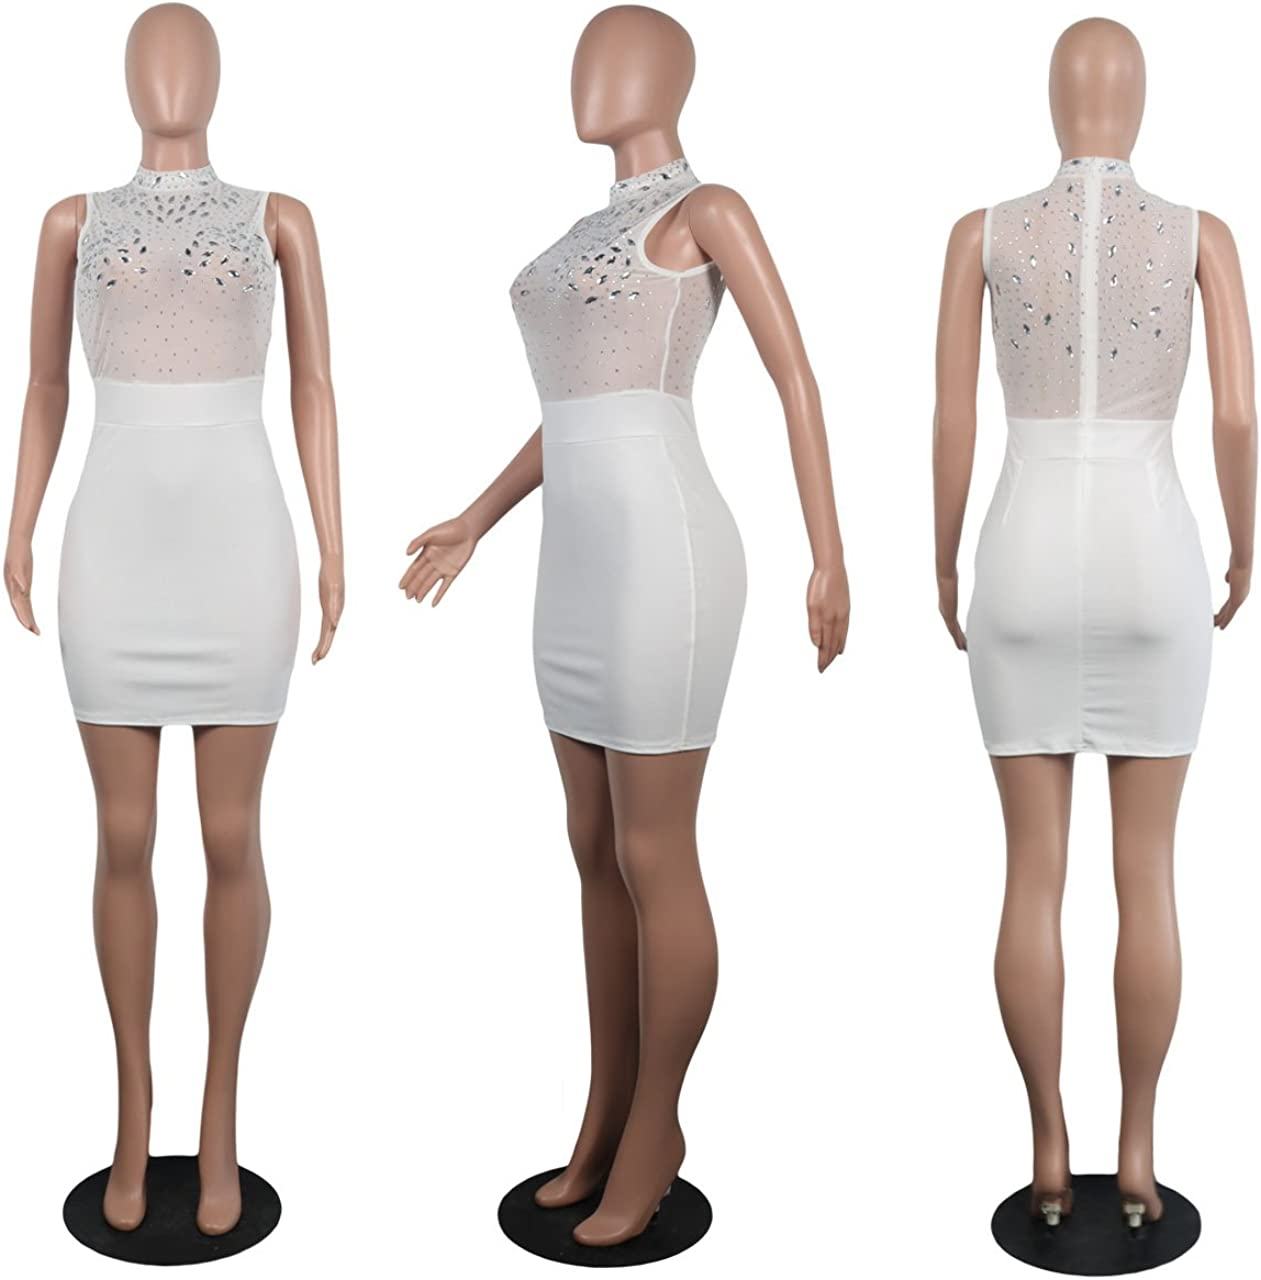 Choichic Women's Rhinestone Bodycon Mini Dress - Sexy Sleeveless Mesh Club See Through Dress